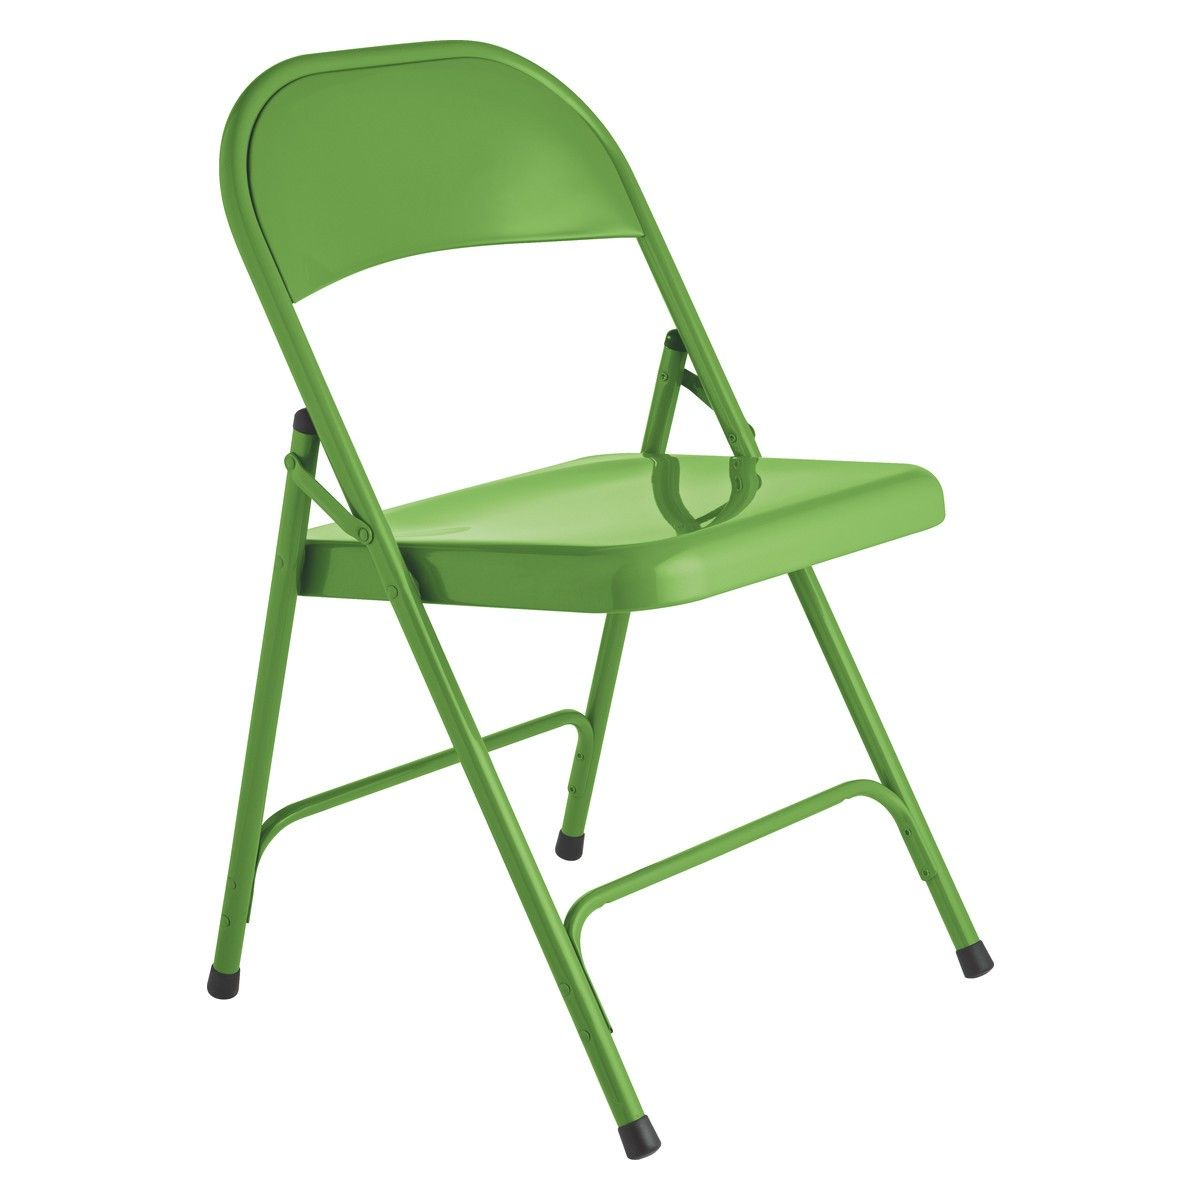 Macadam Green Metal Folding Chair Metal Folding Chairs